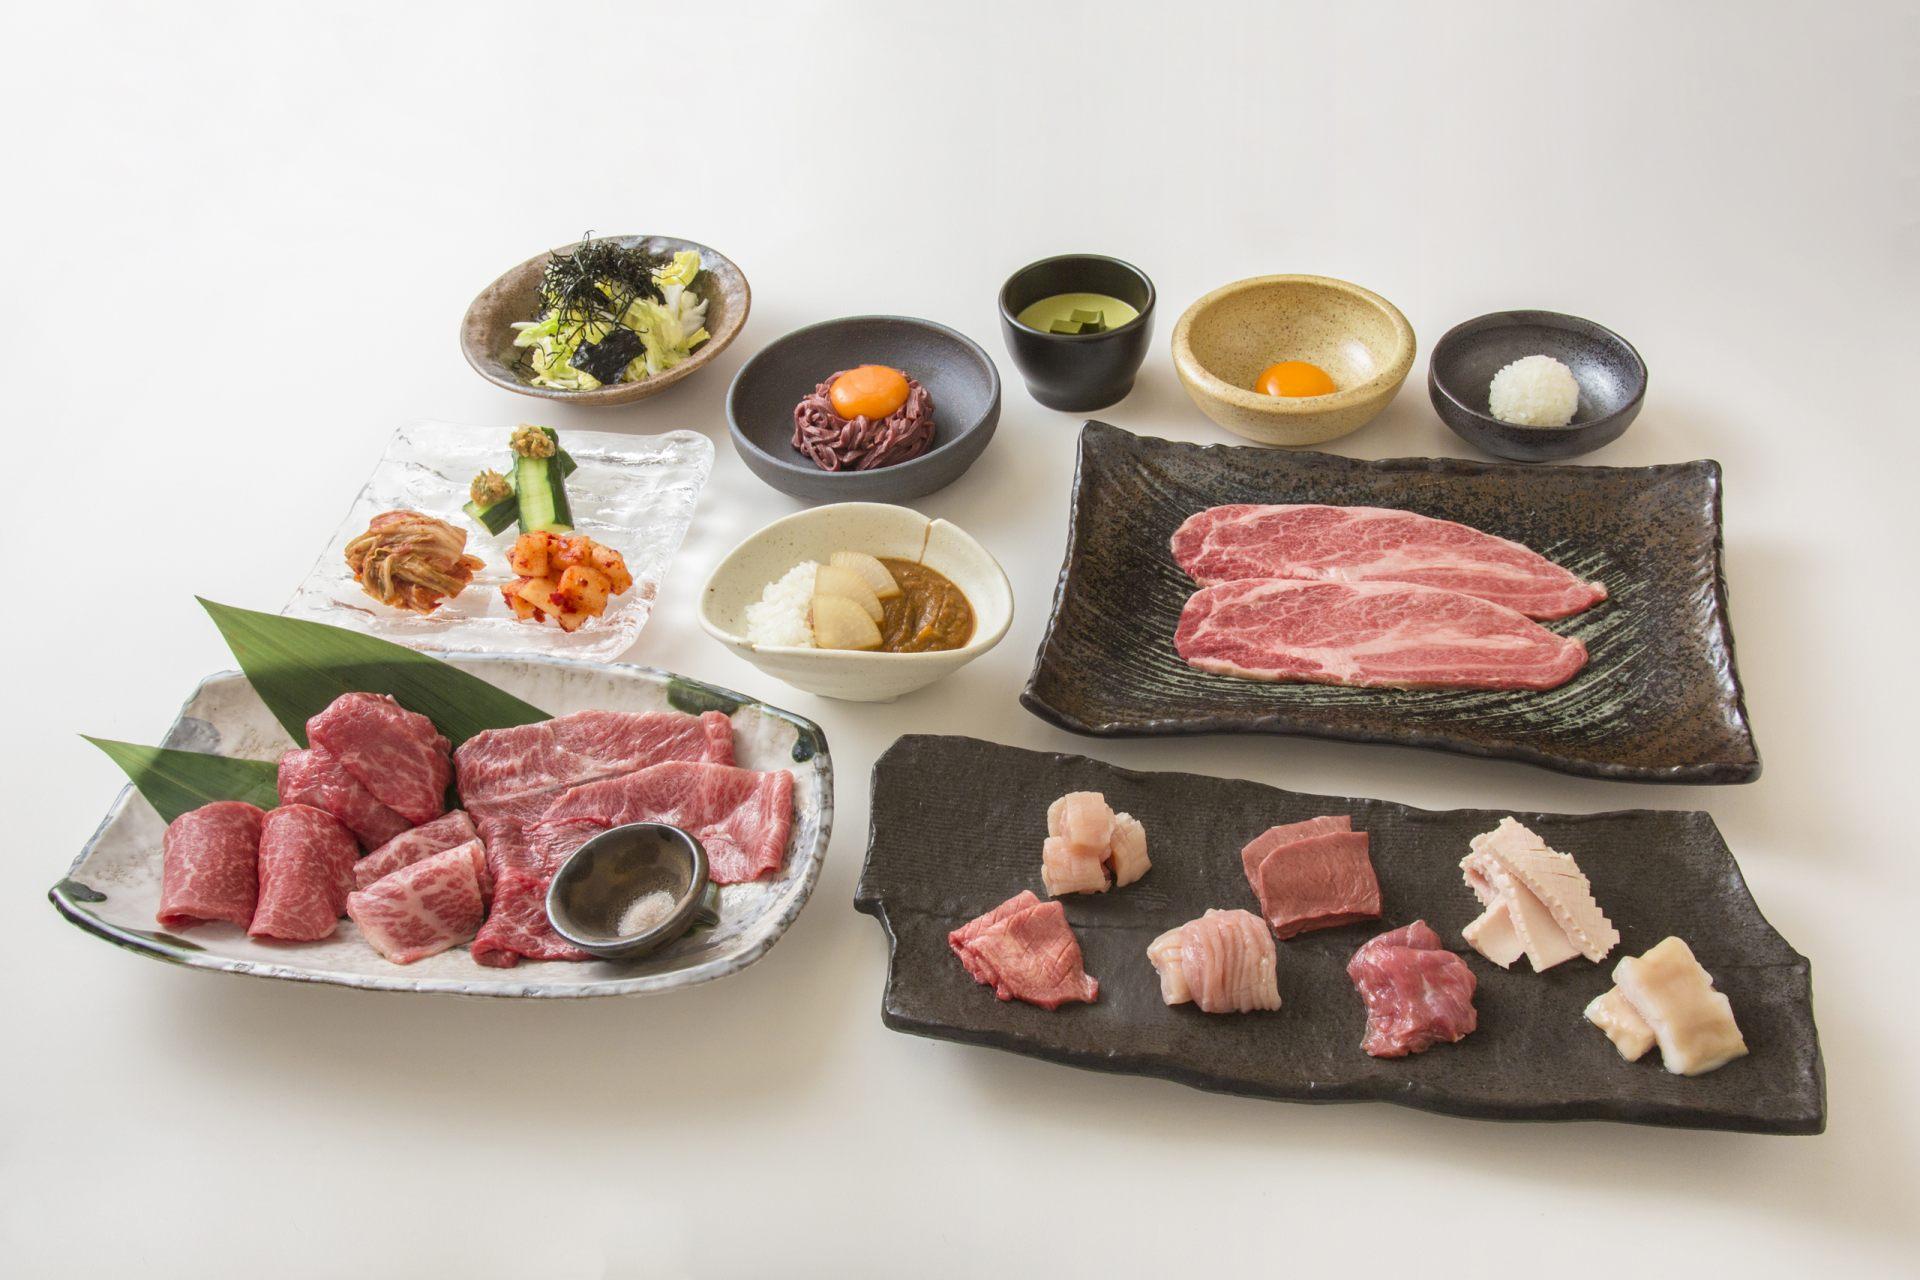 A5黑毛和牛套餐(2人份/4000日圓)